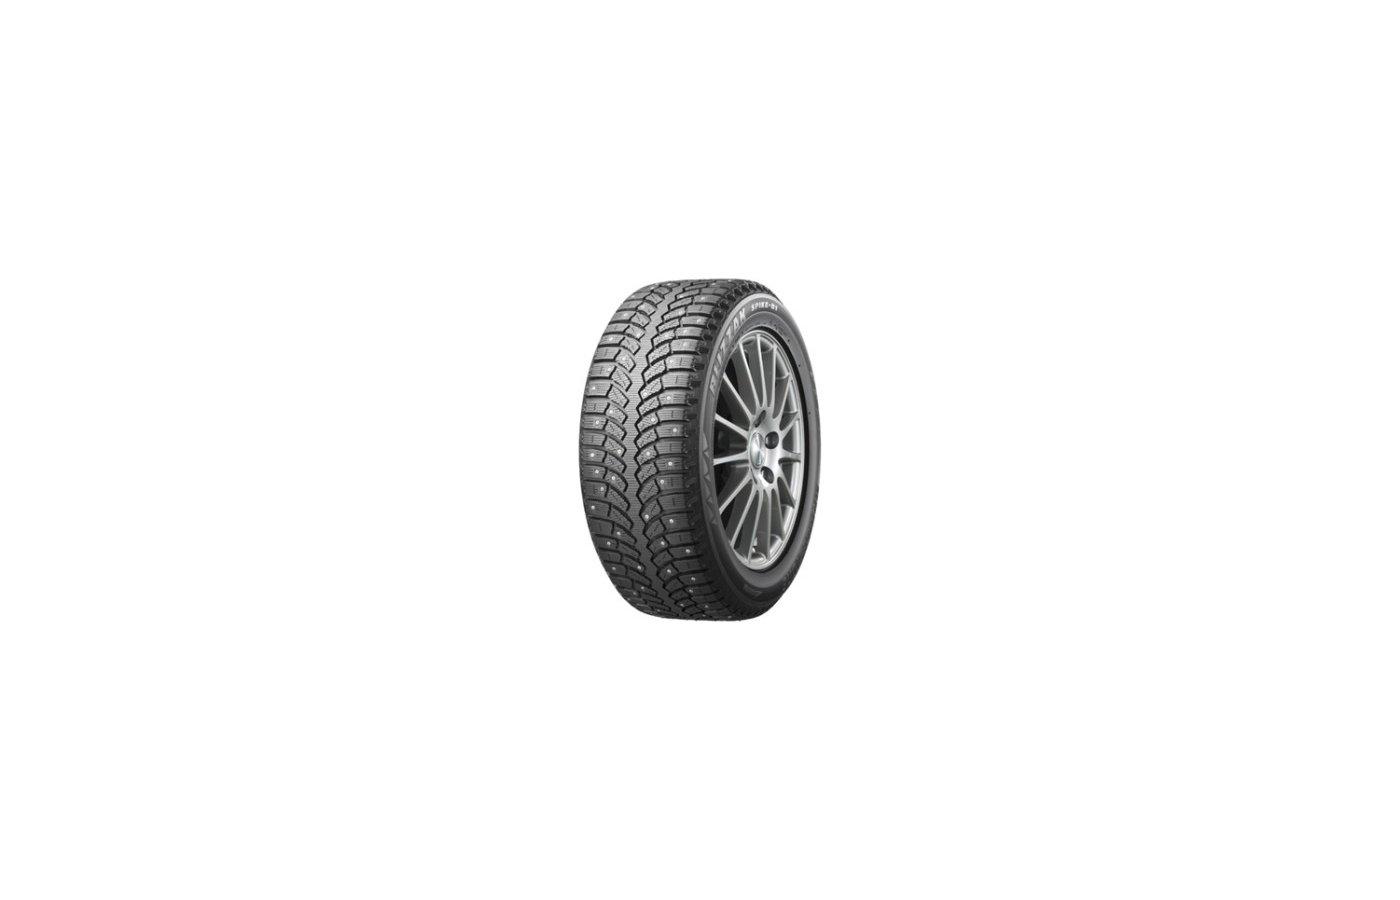 Шина Bridgestone Blizzak Spike-01 215/70 R16 TL 100T шип